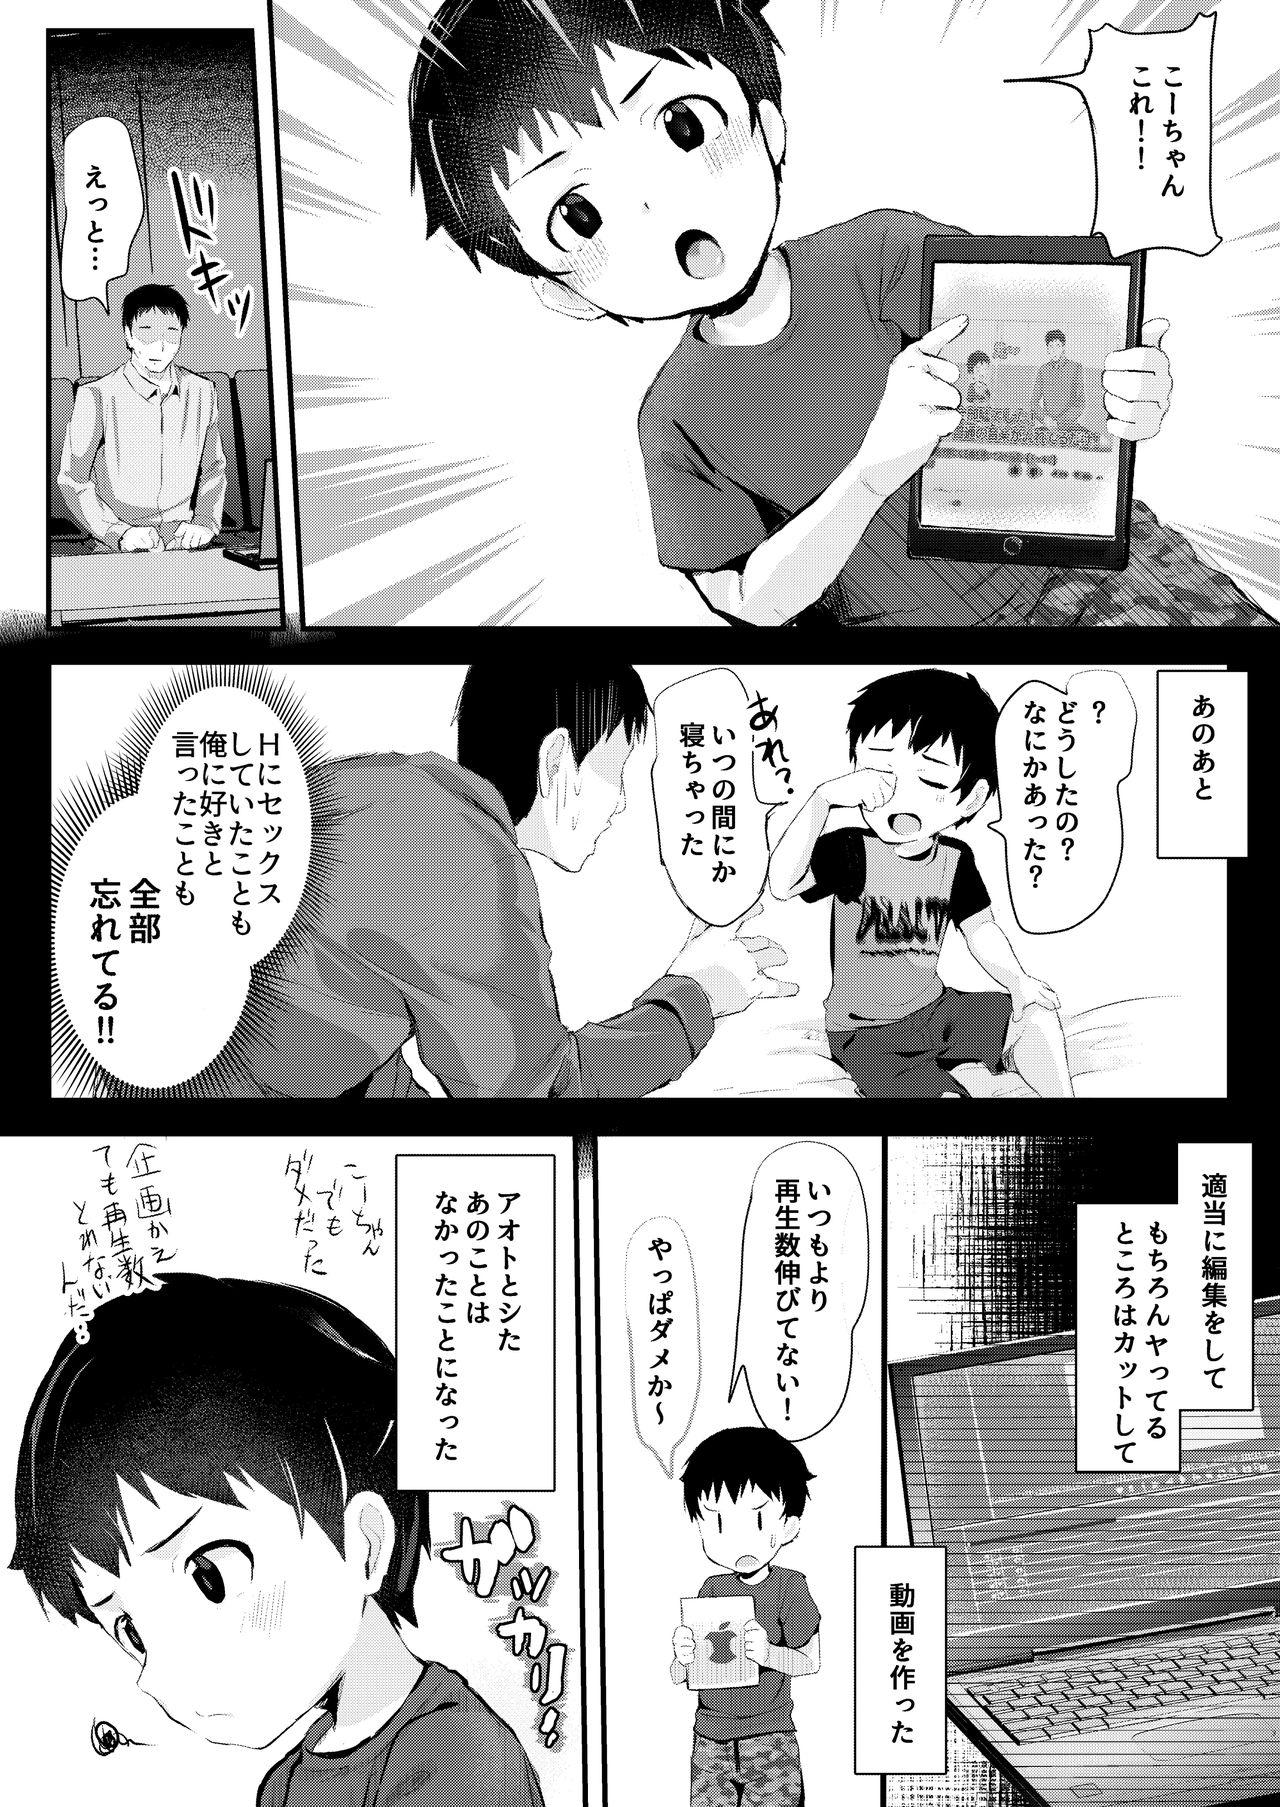 Dokidoki Dougazukuri! 26